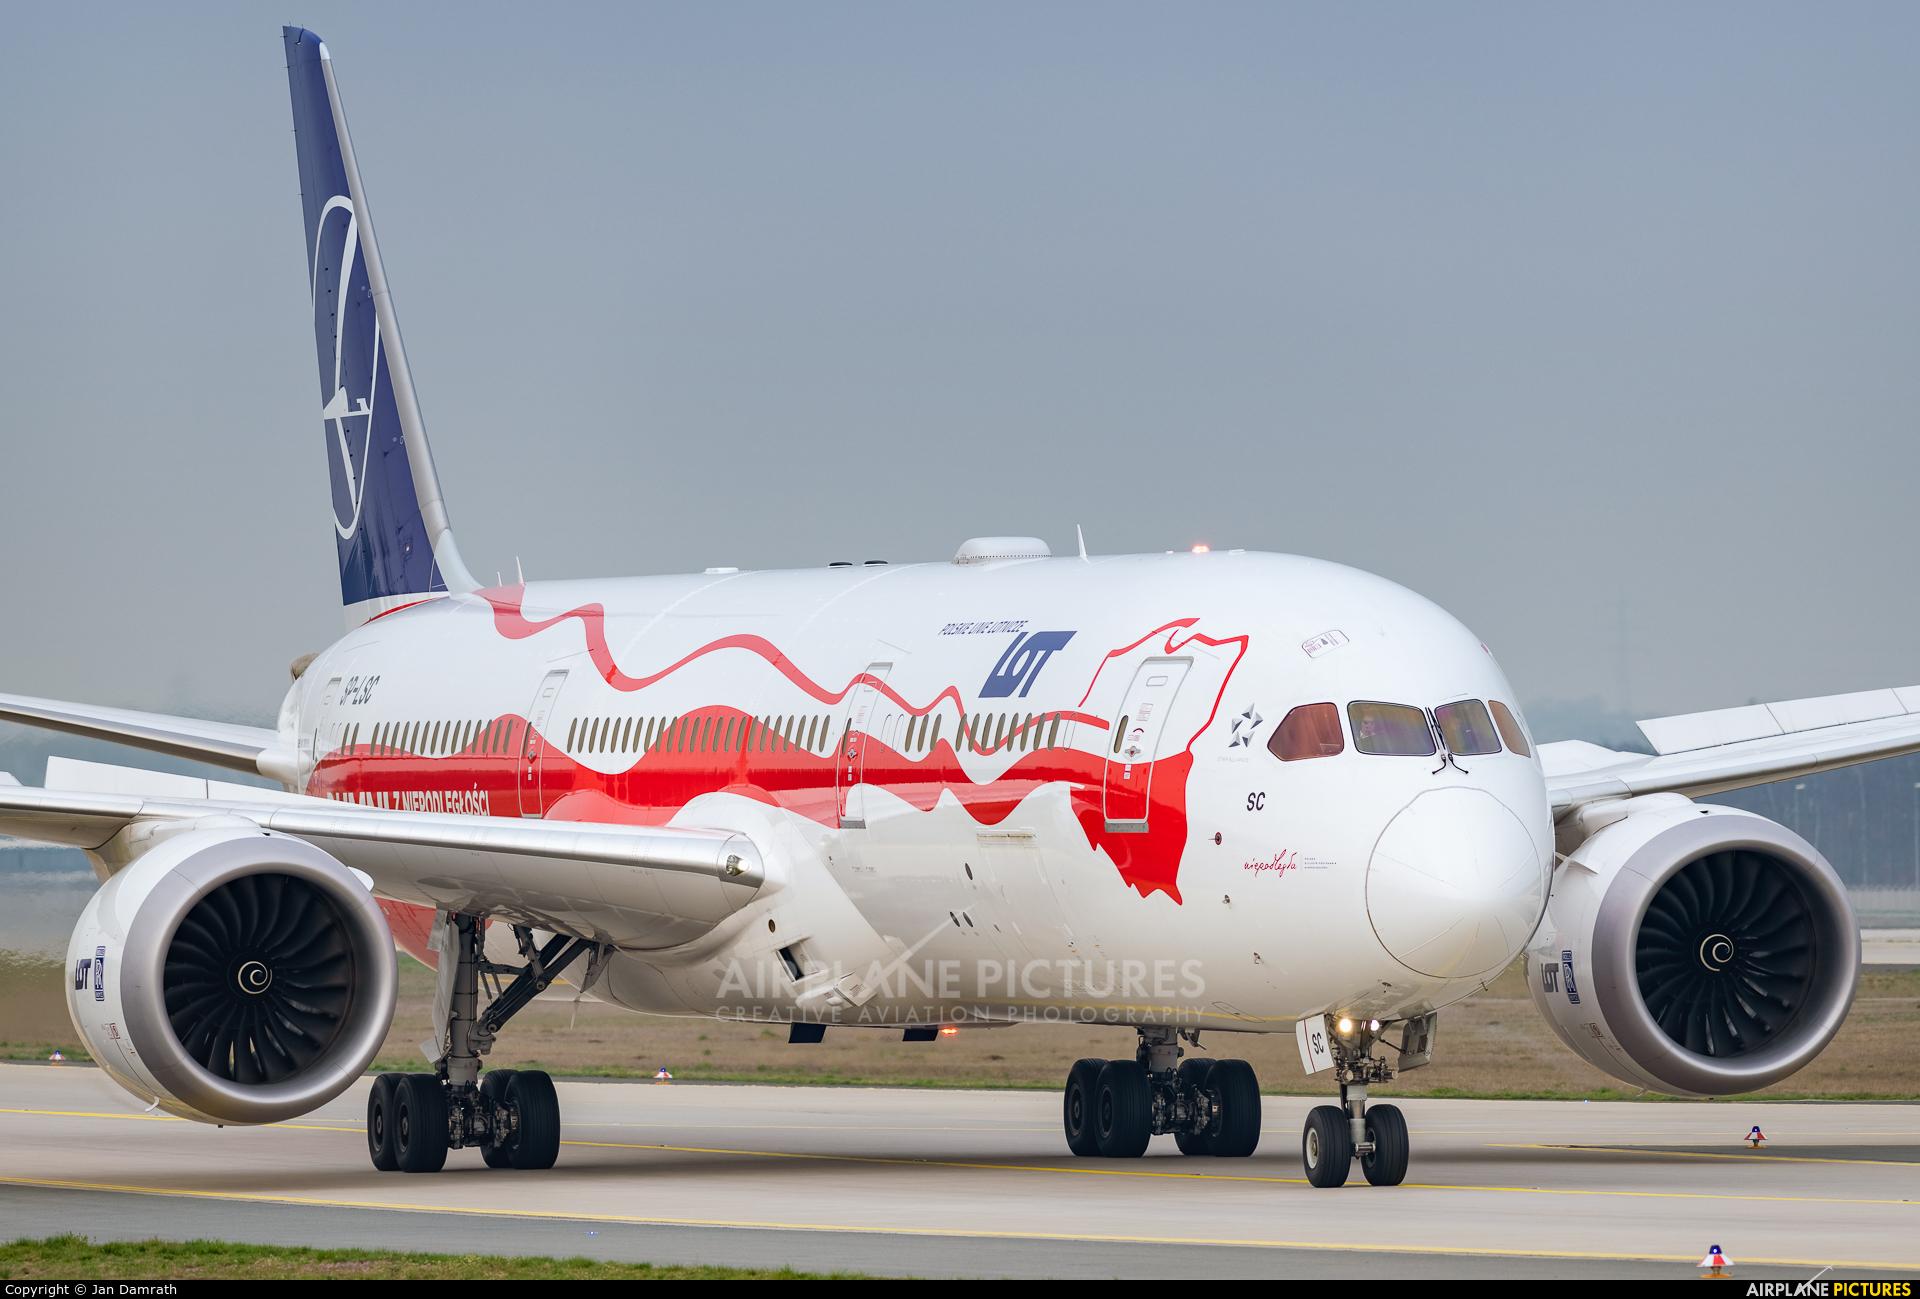 LOT - Polish Airlines SP-LSC aircraft at Frankfurt